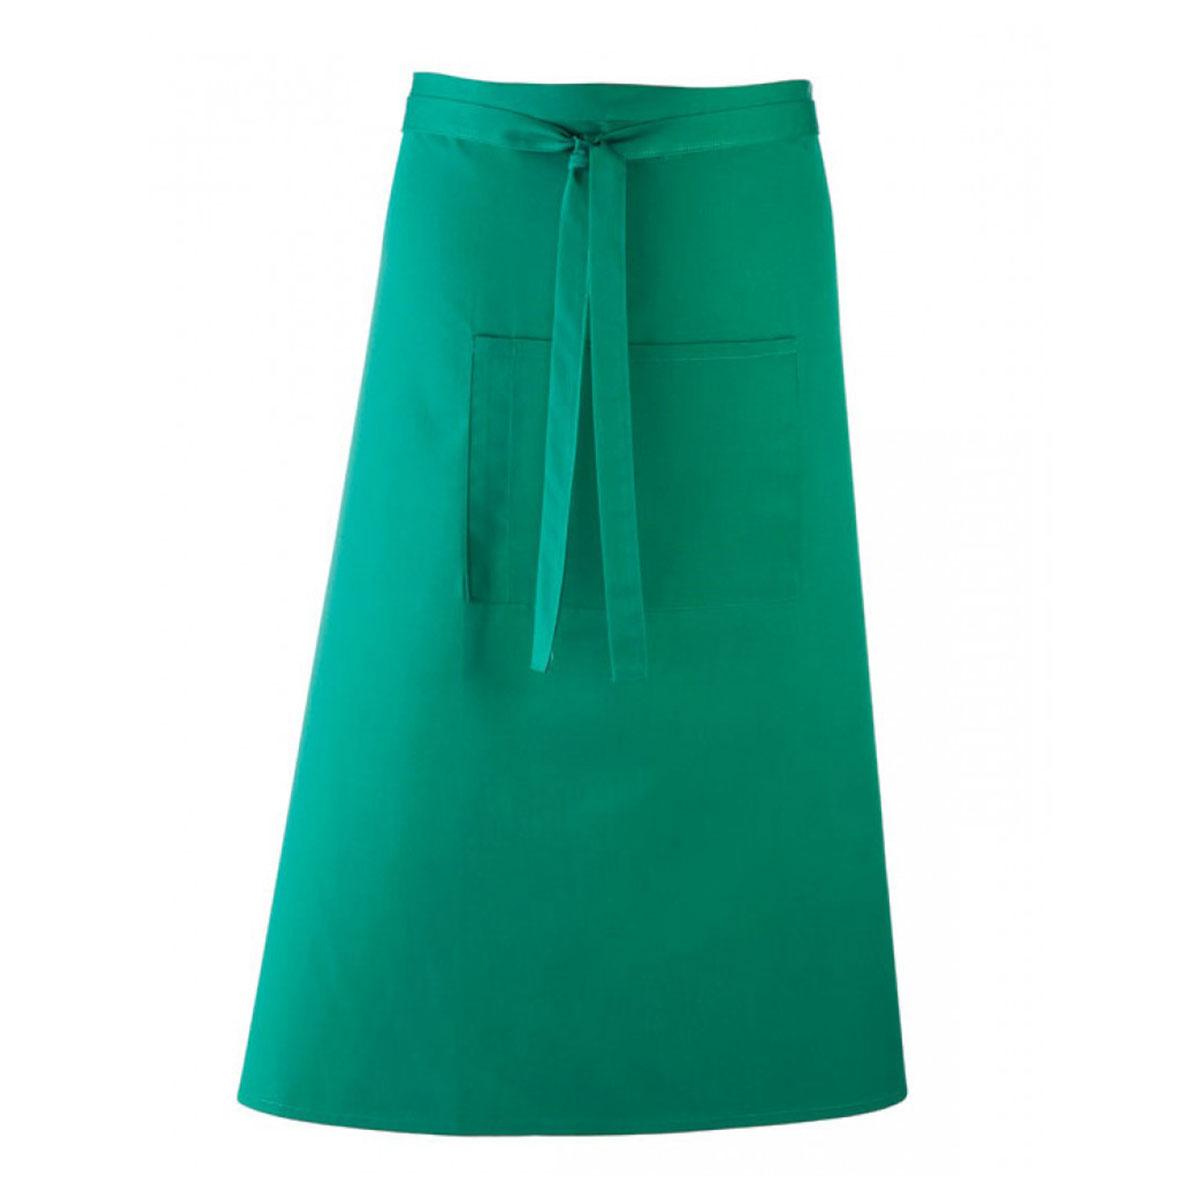 Colours Hospitality Apron - pr158_emerald